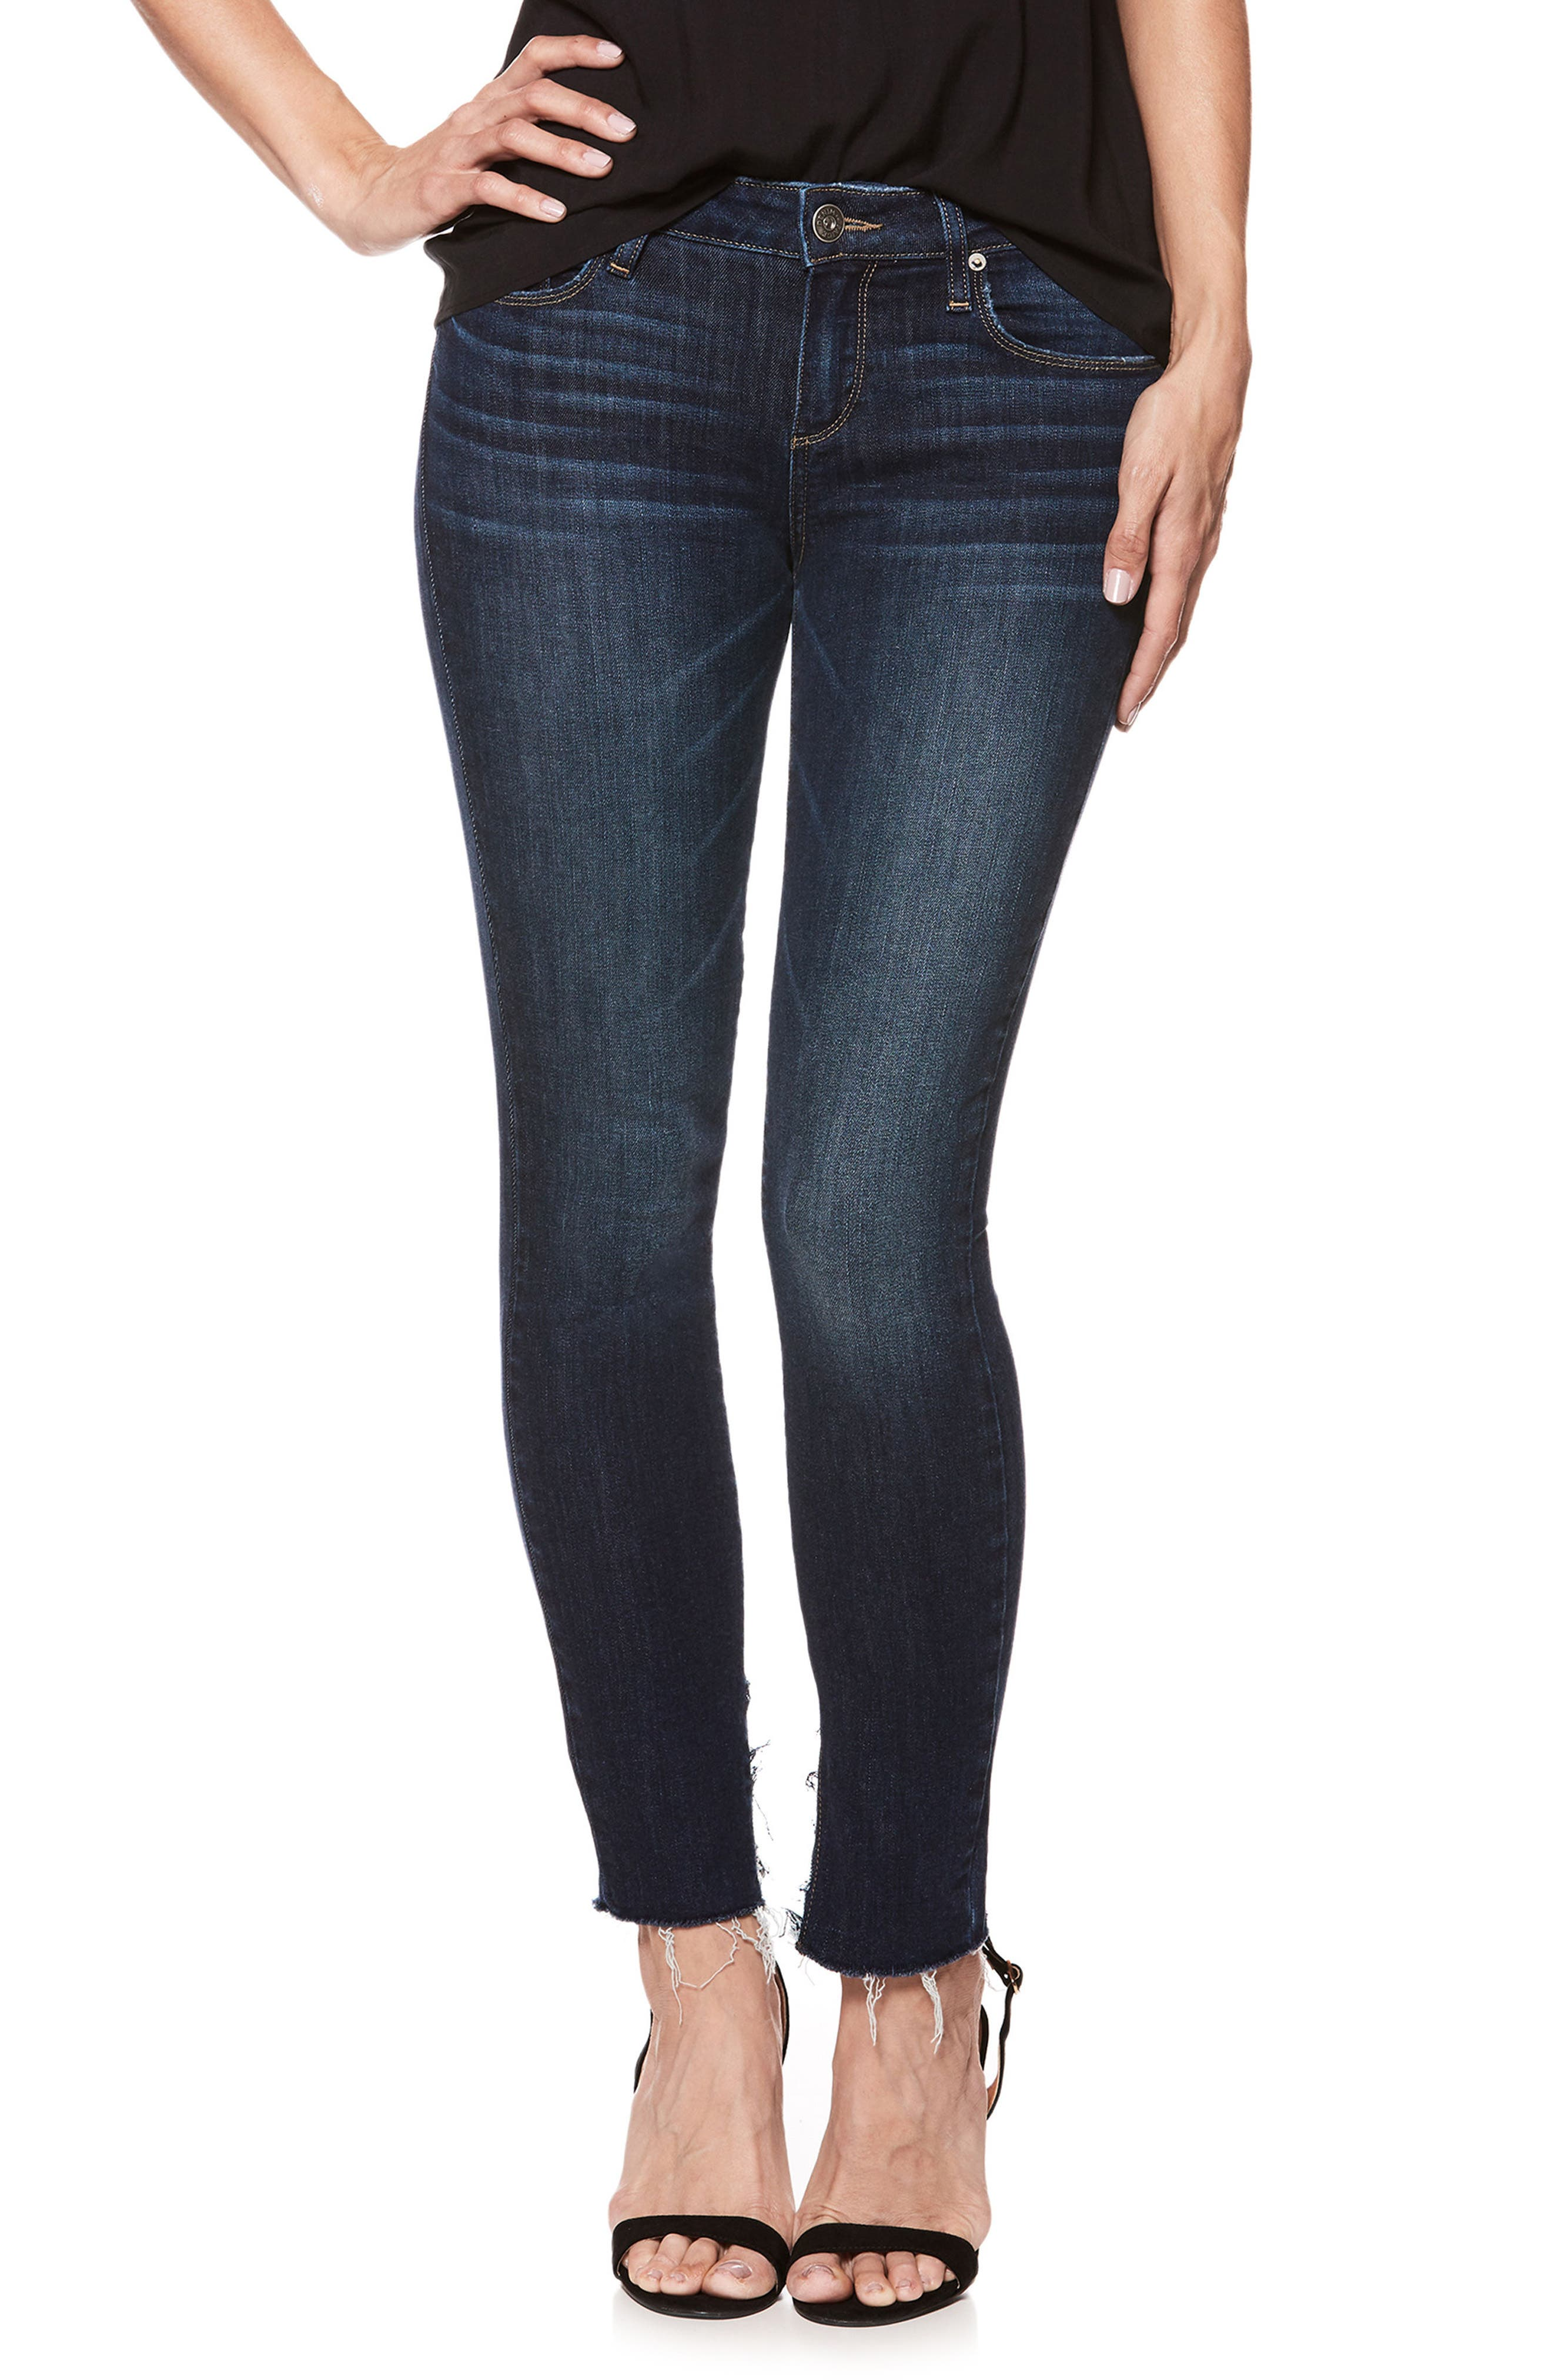 Transcend Vintage - Verdugo Ankle Ultra Skinny Jeans,                         Main,                         color, Mazzetti